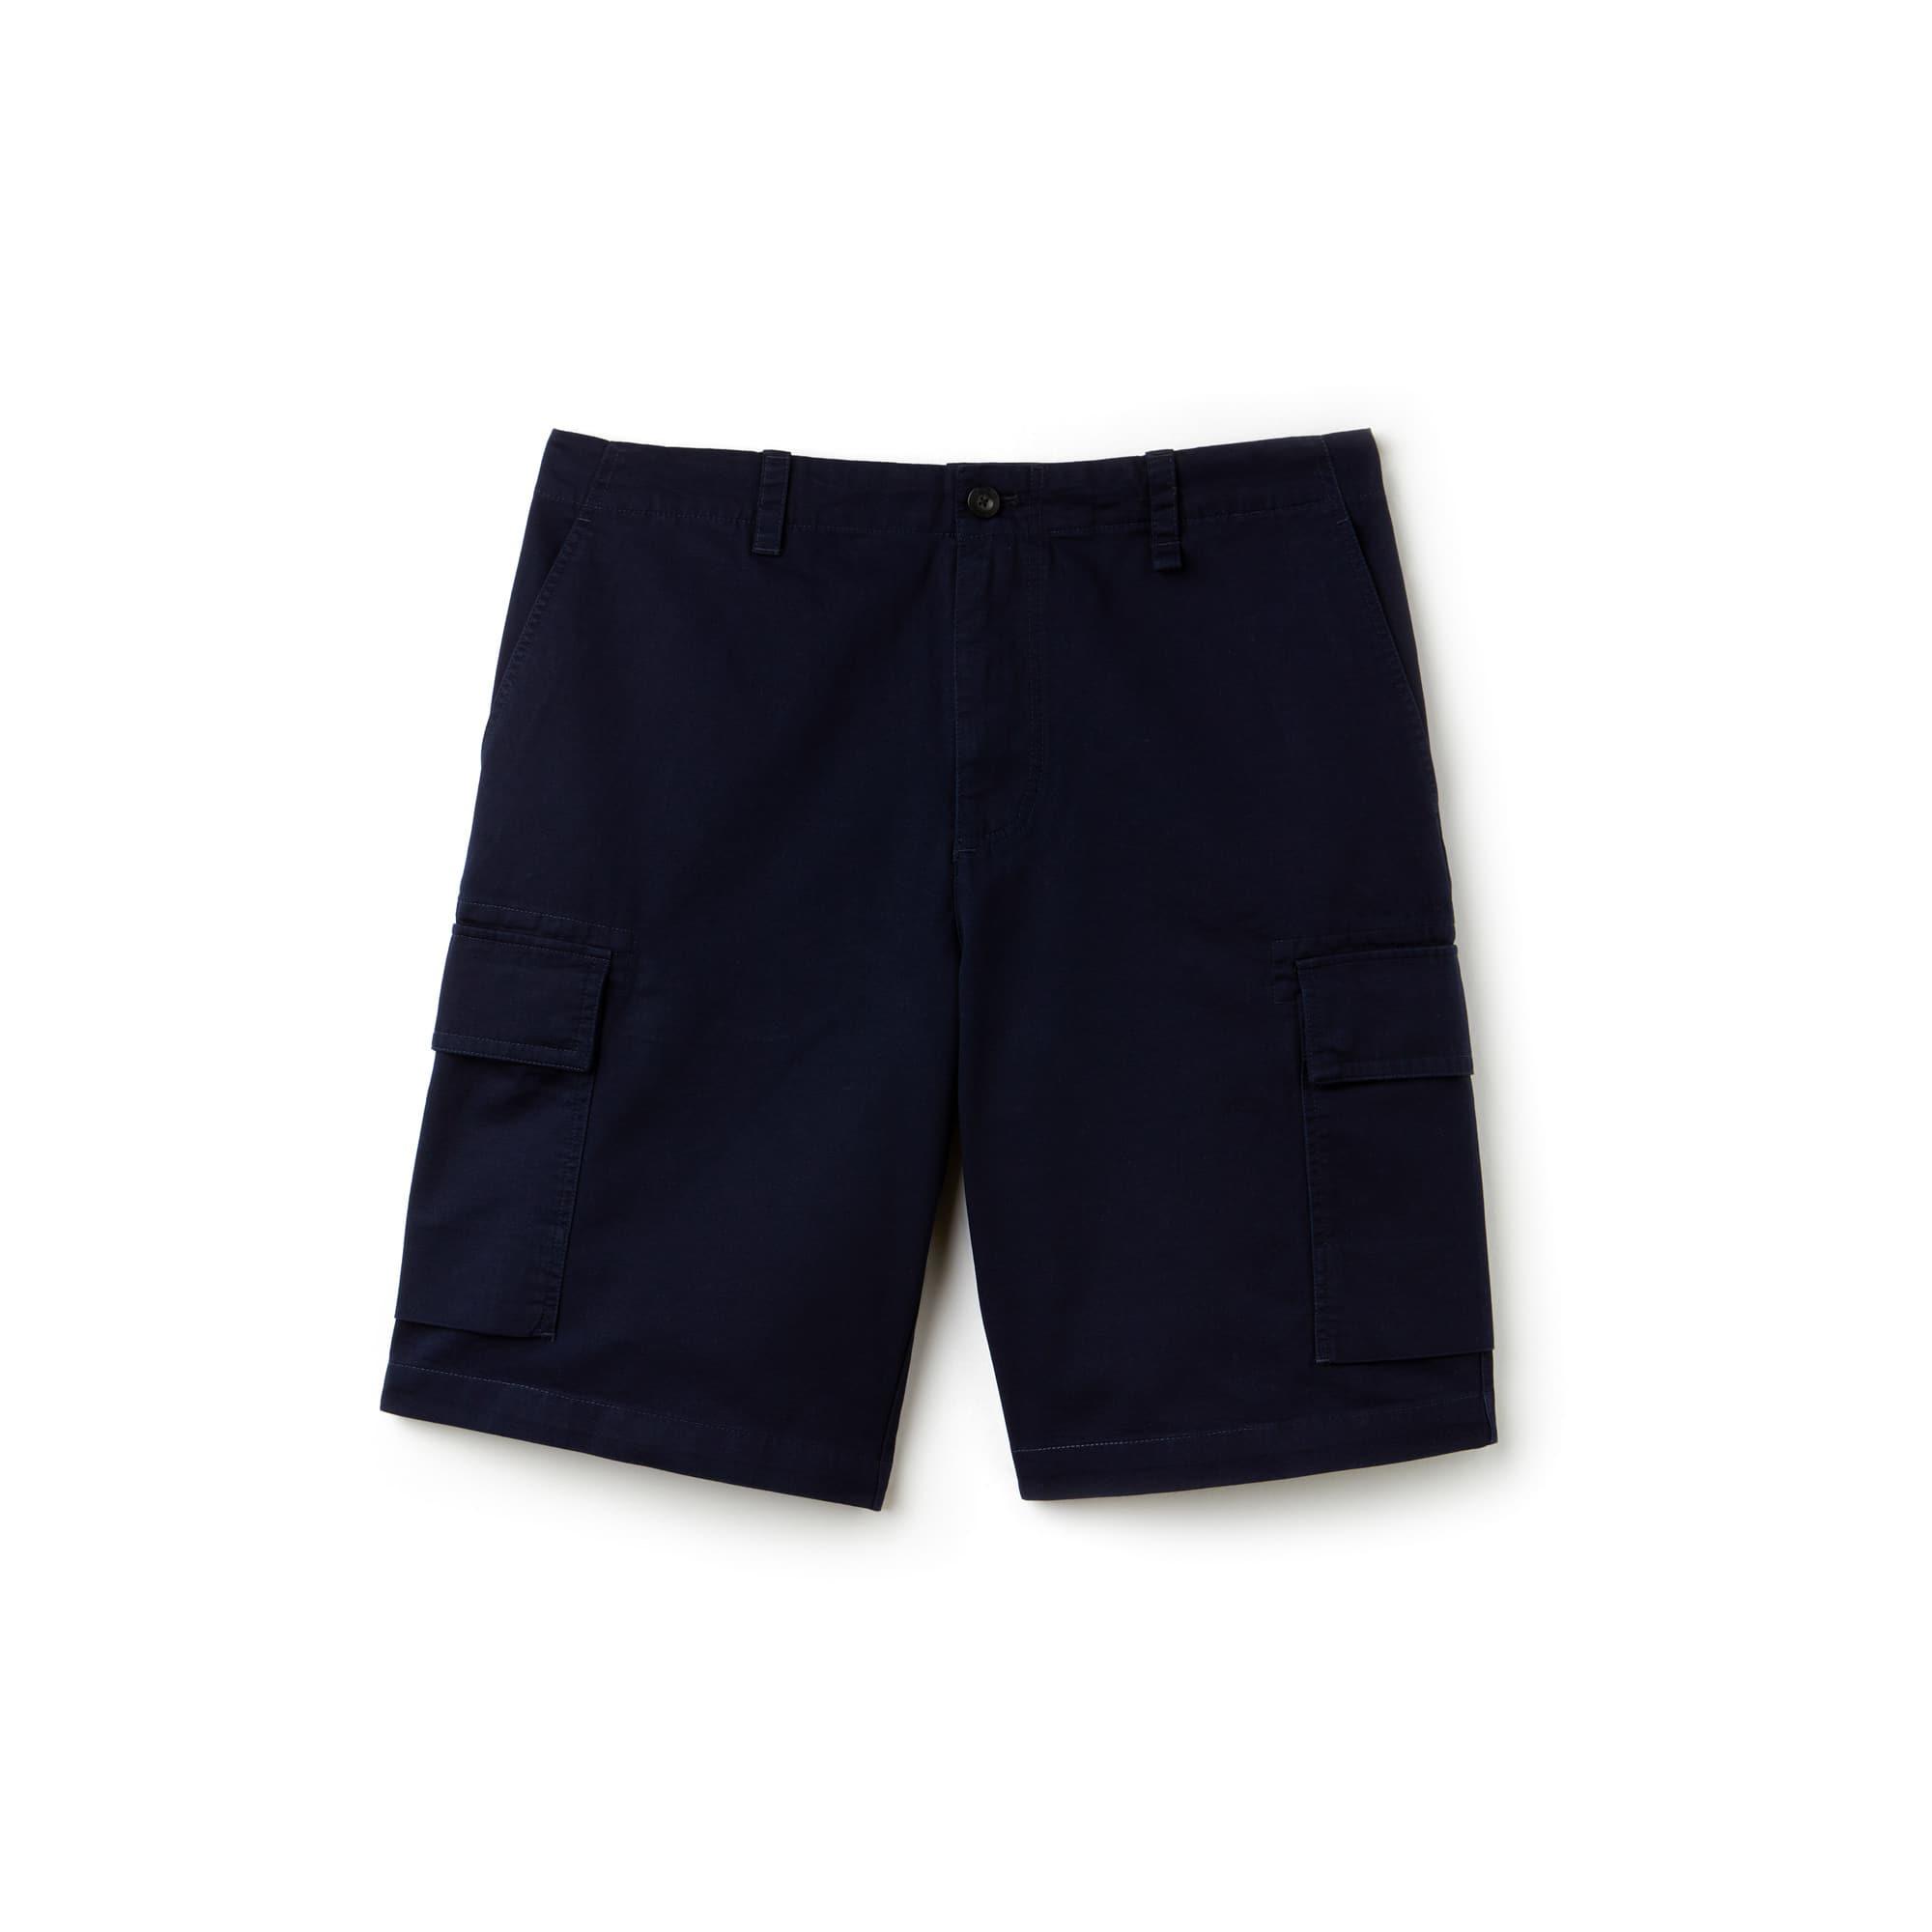 Bermudas cargo de sarga de algodón liso con bolsillos